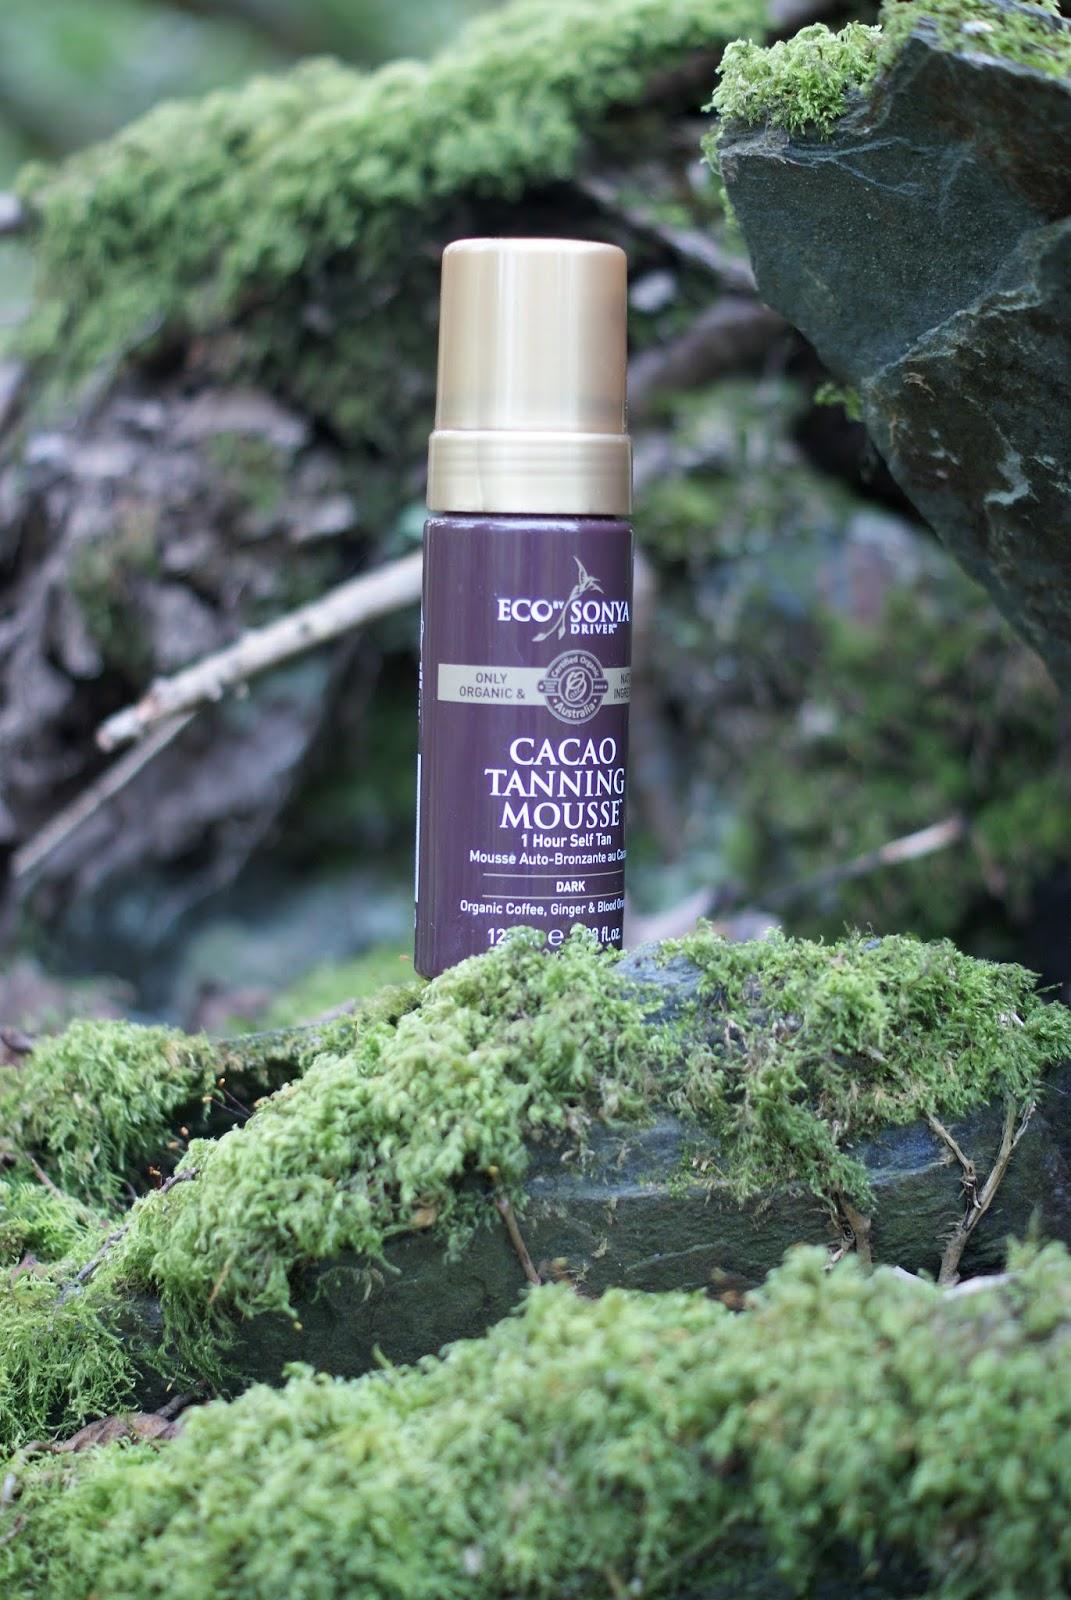 Cacao Tanning Mousse. Naturalny samoopalacz w piance/Eco By Sonya.